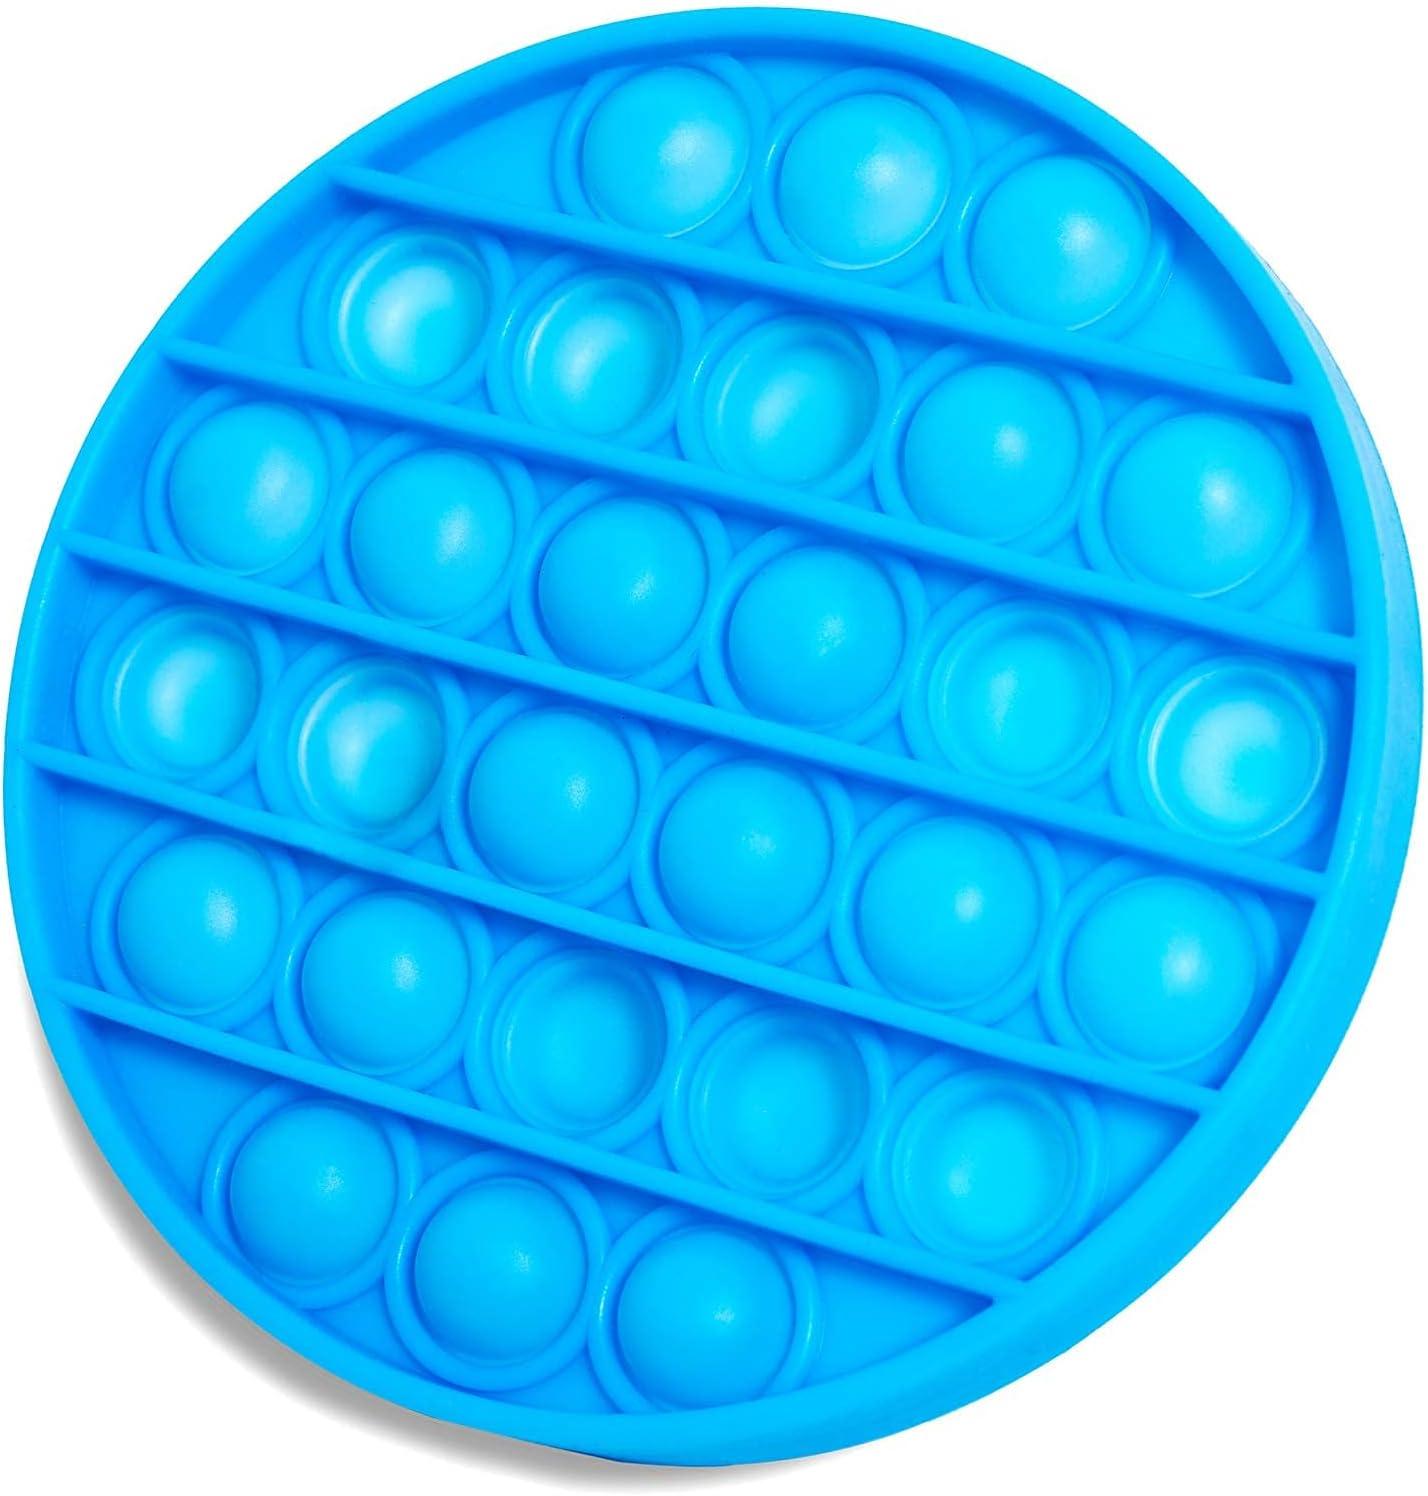 Save money Pop Fidget 2021 autumn and winter new Toys Push Bubble Relief an Sensory Stress